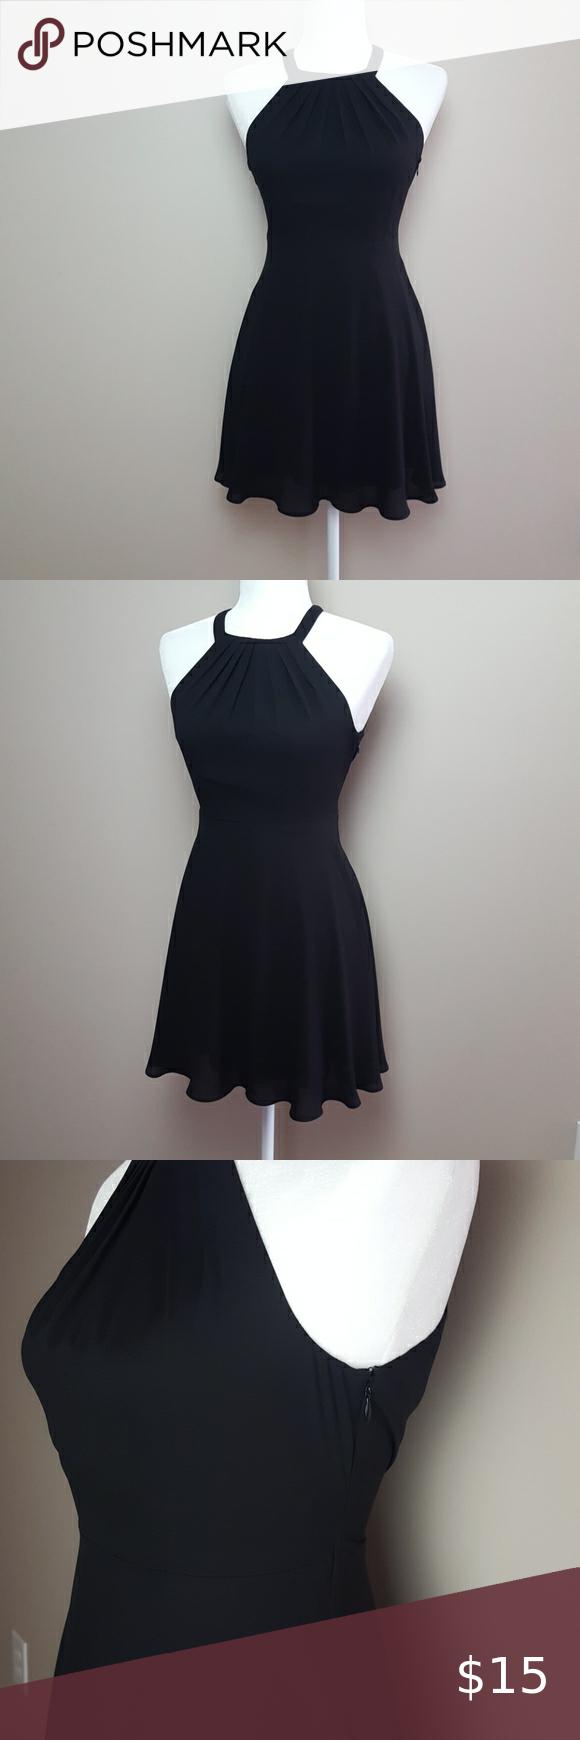 Little Black Dress Little Black Dress Clothes Design Express Dresses